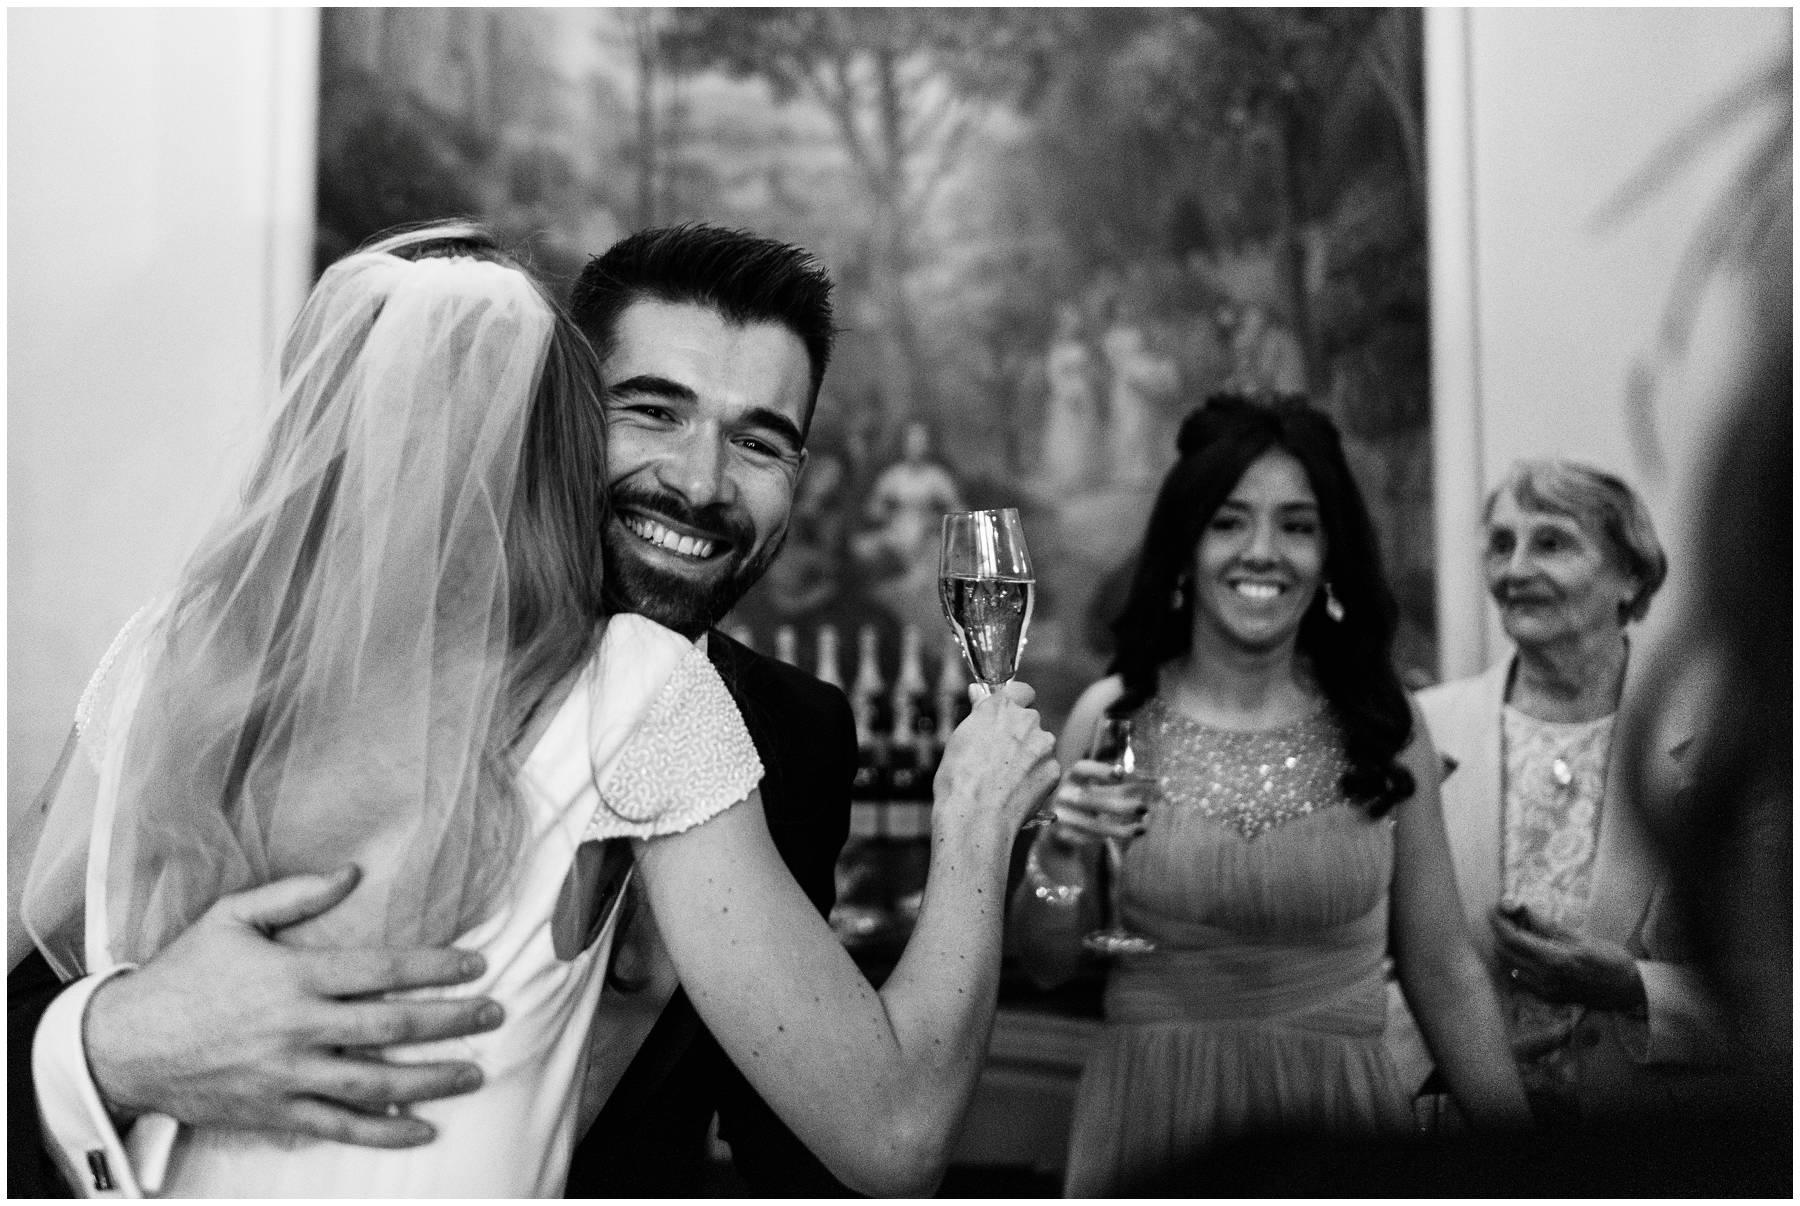 Reportage Wedding Photography at St Pancras Renaissance Hotel